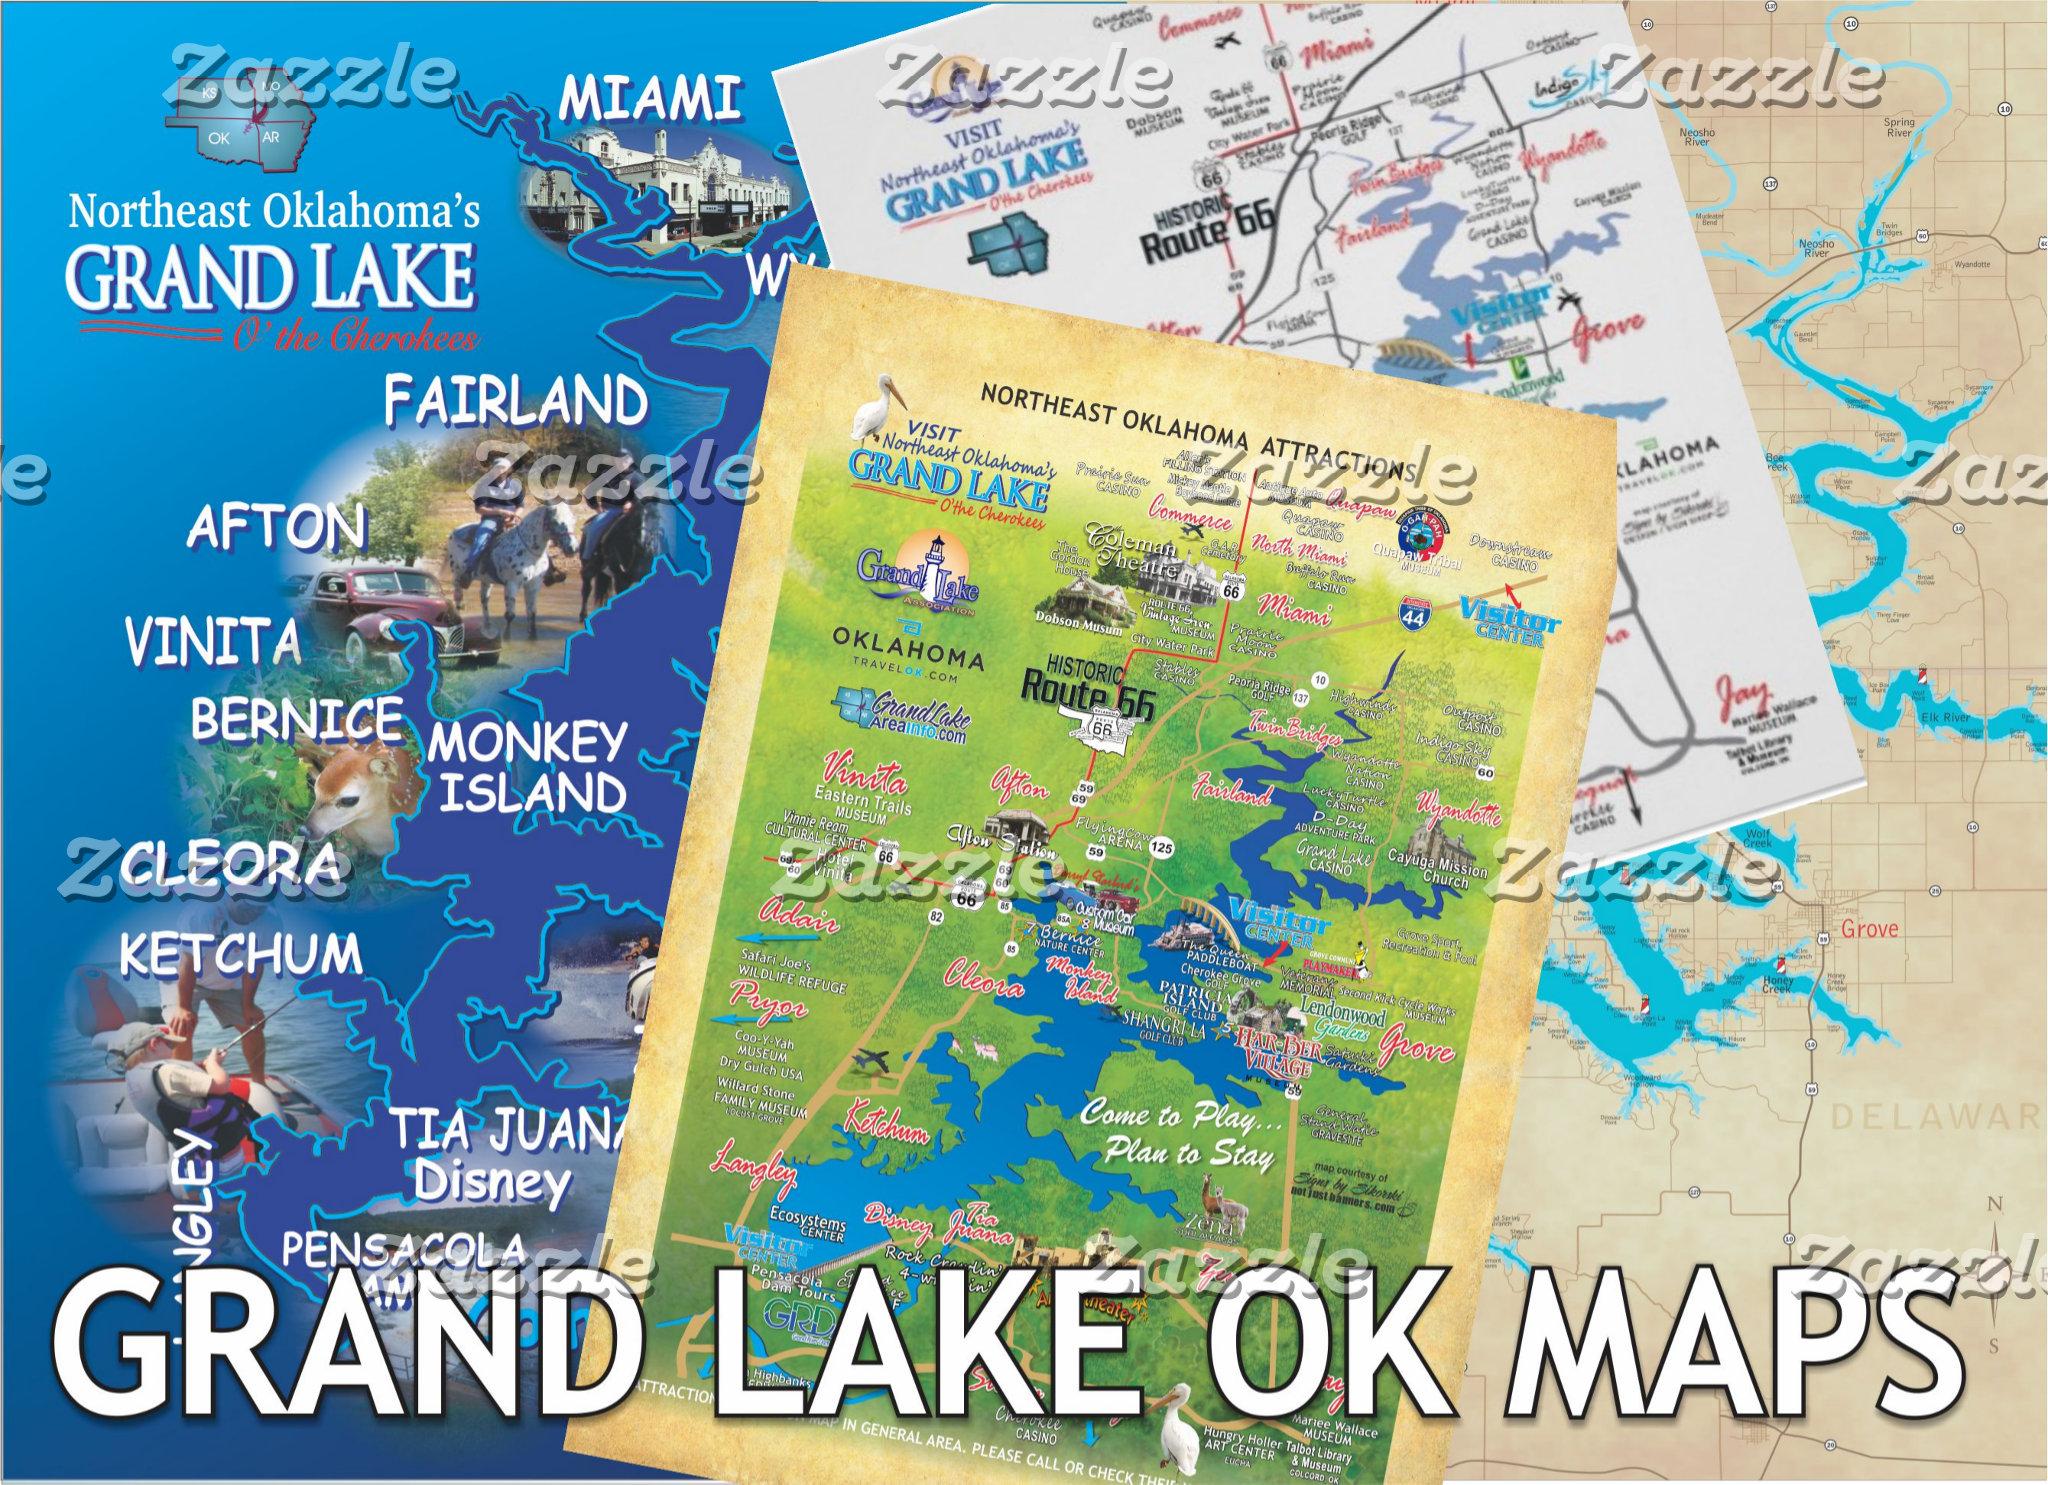 Grand Lake OK Maps